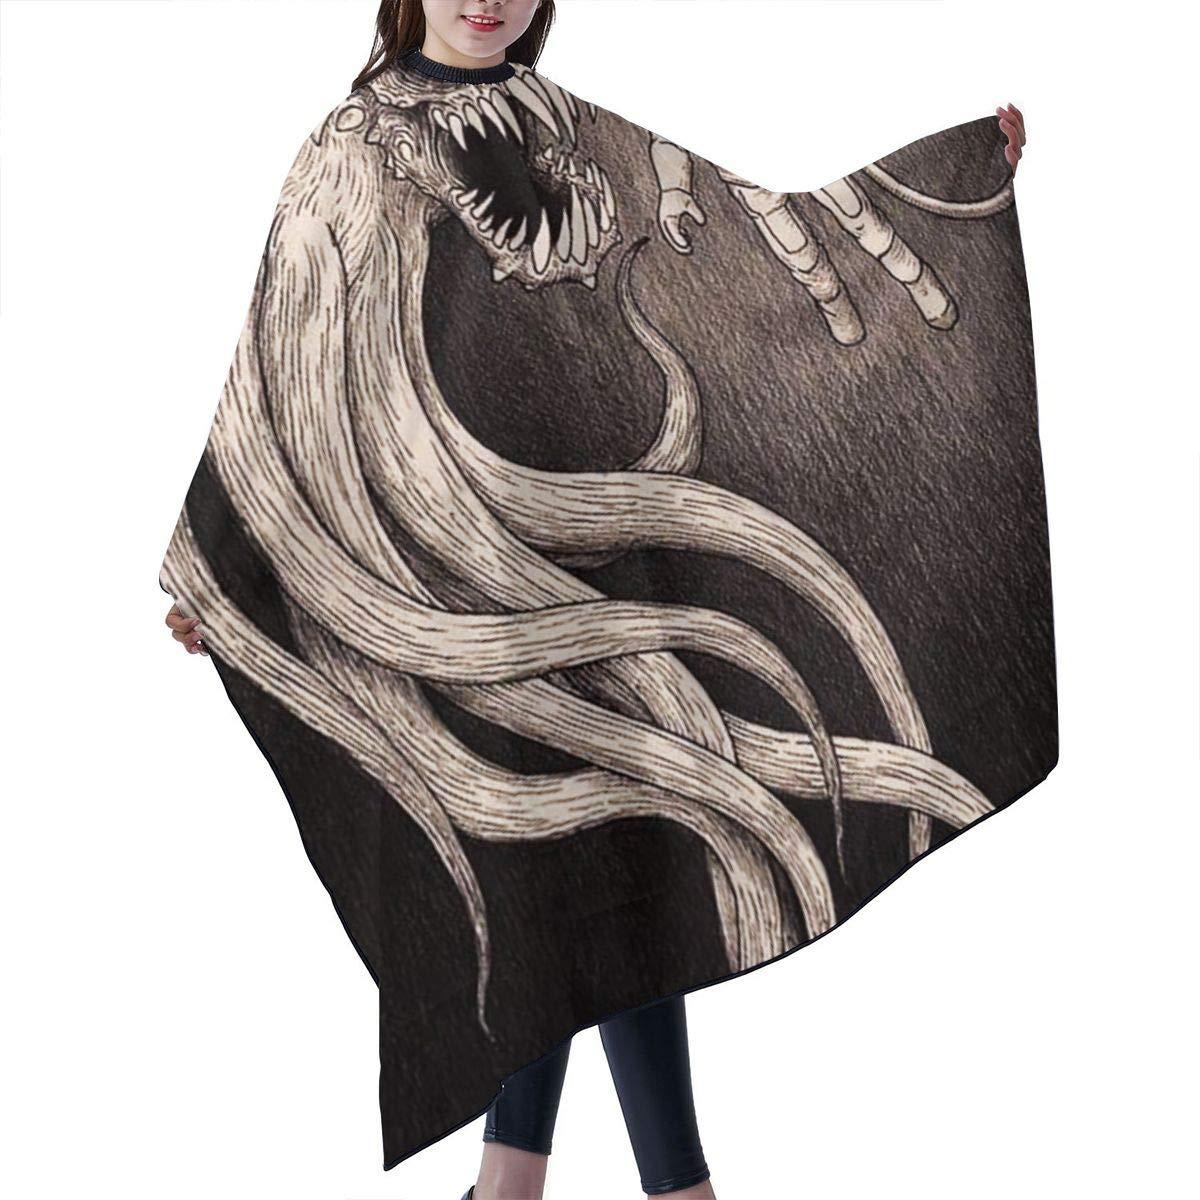 Horror Creepy Monster Astronaut Waterproof 新品 送料無料 Nyl Cape Styling ランキングTOP5 Hair